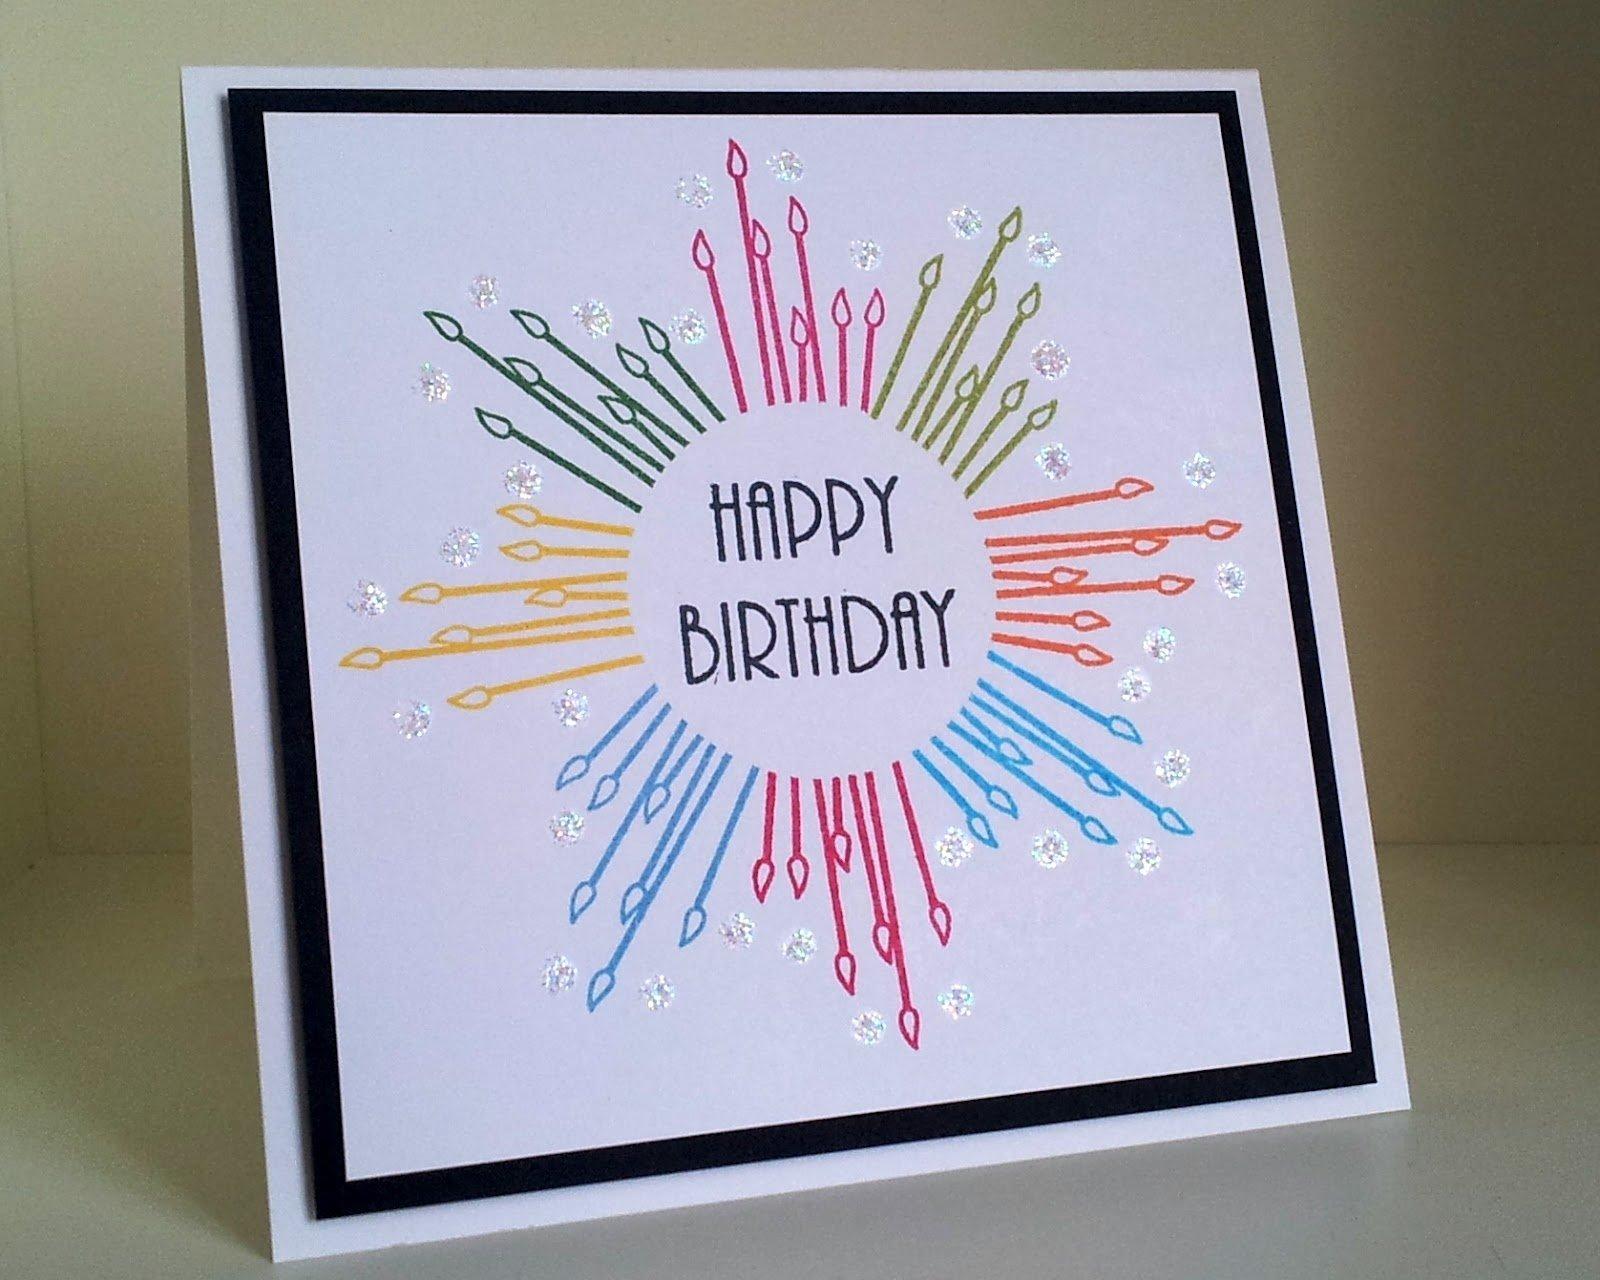 10 Stylish Good Ideas For Birthday Cards cool birthday card ideas inside cool birthday card ideas card 1 2020